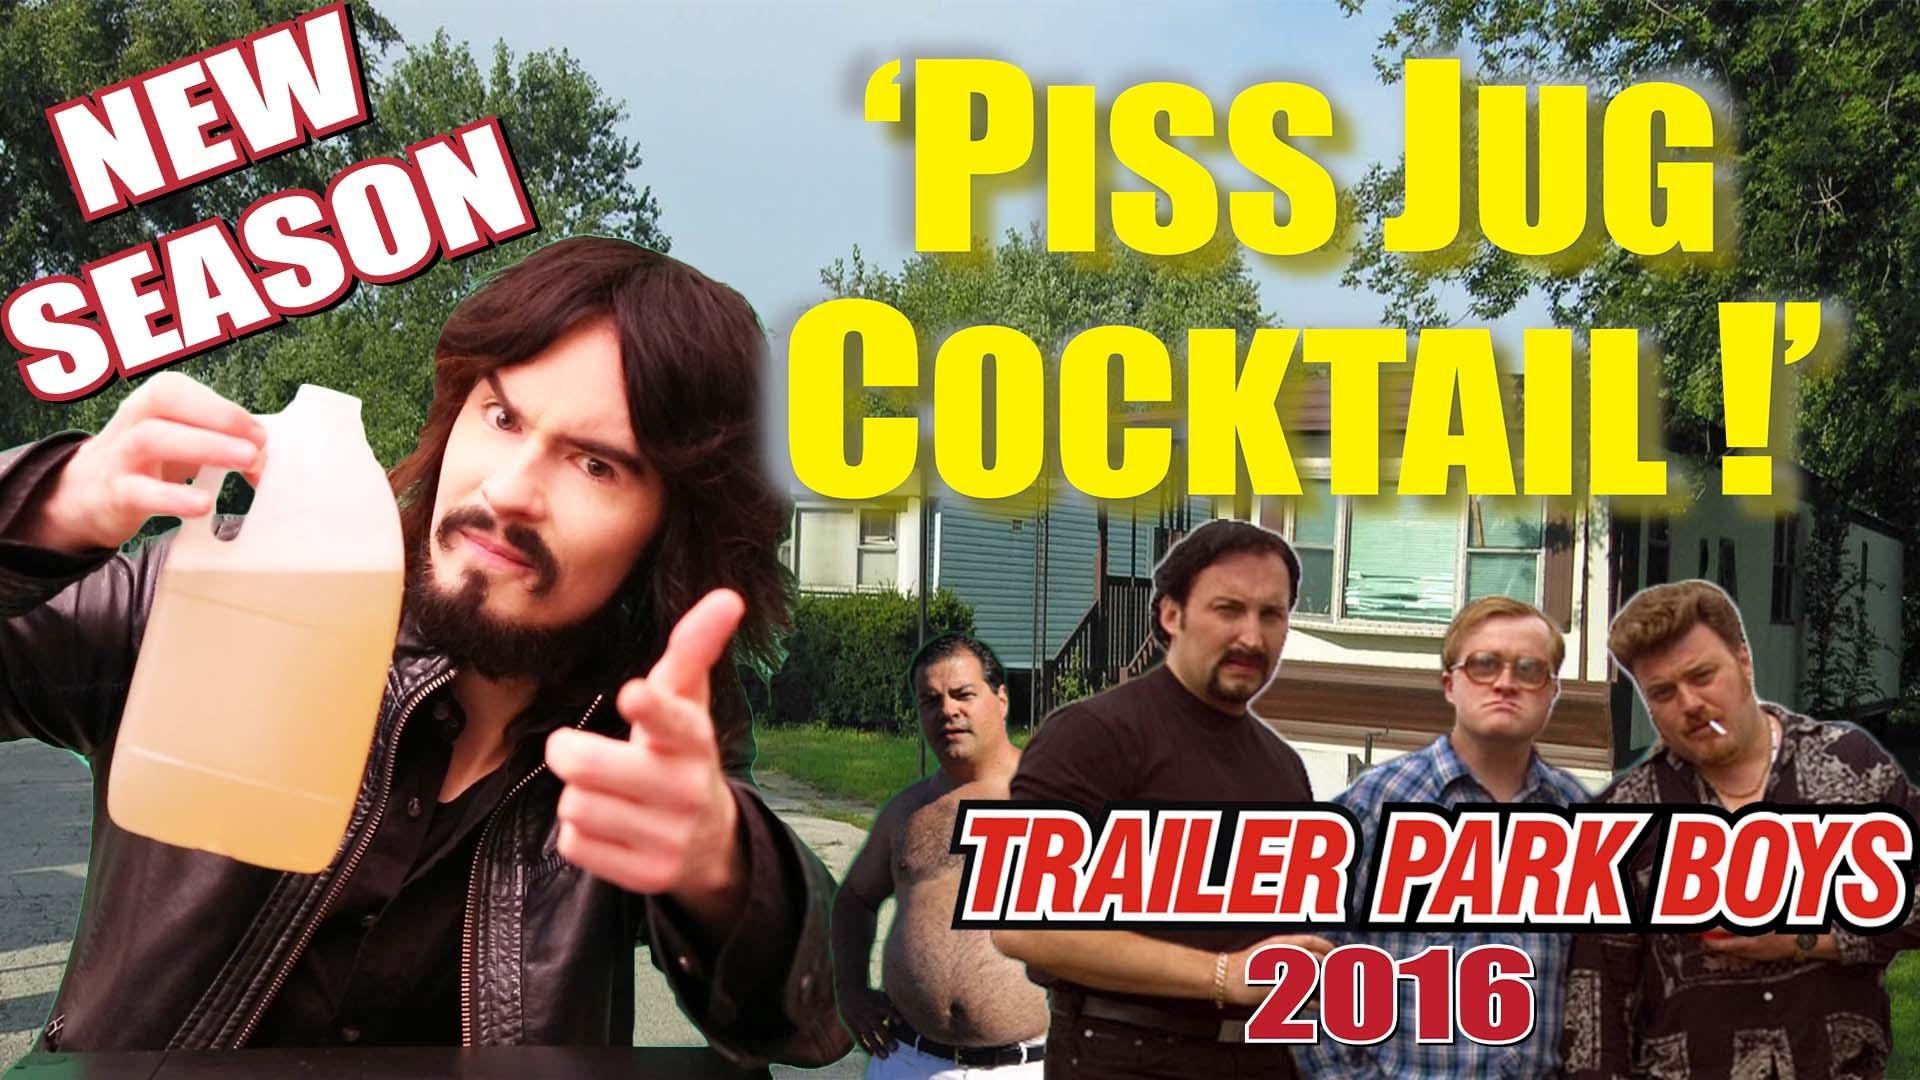 'Trailer Park Boys' – Piss Jug Cocktail – New Season 10 – (2016) – YouTube